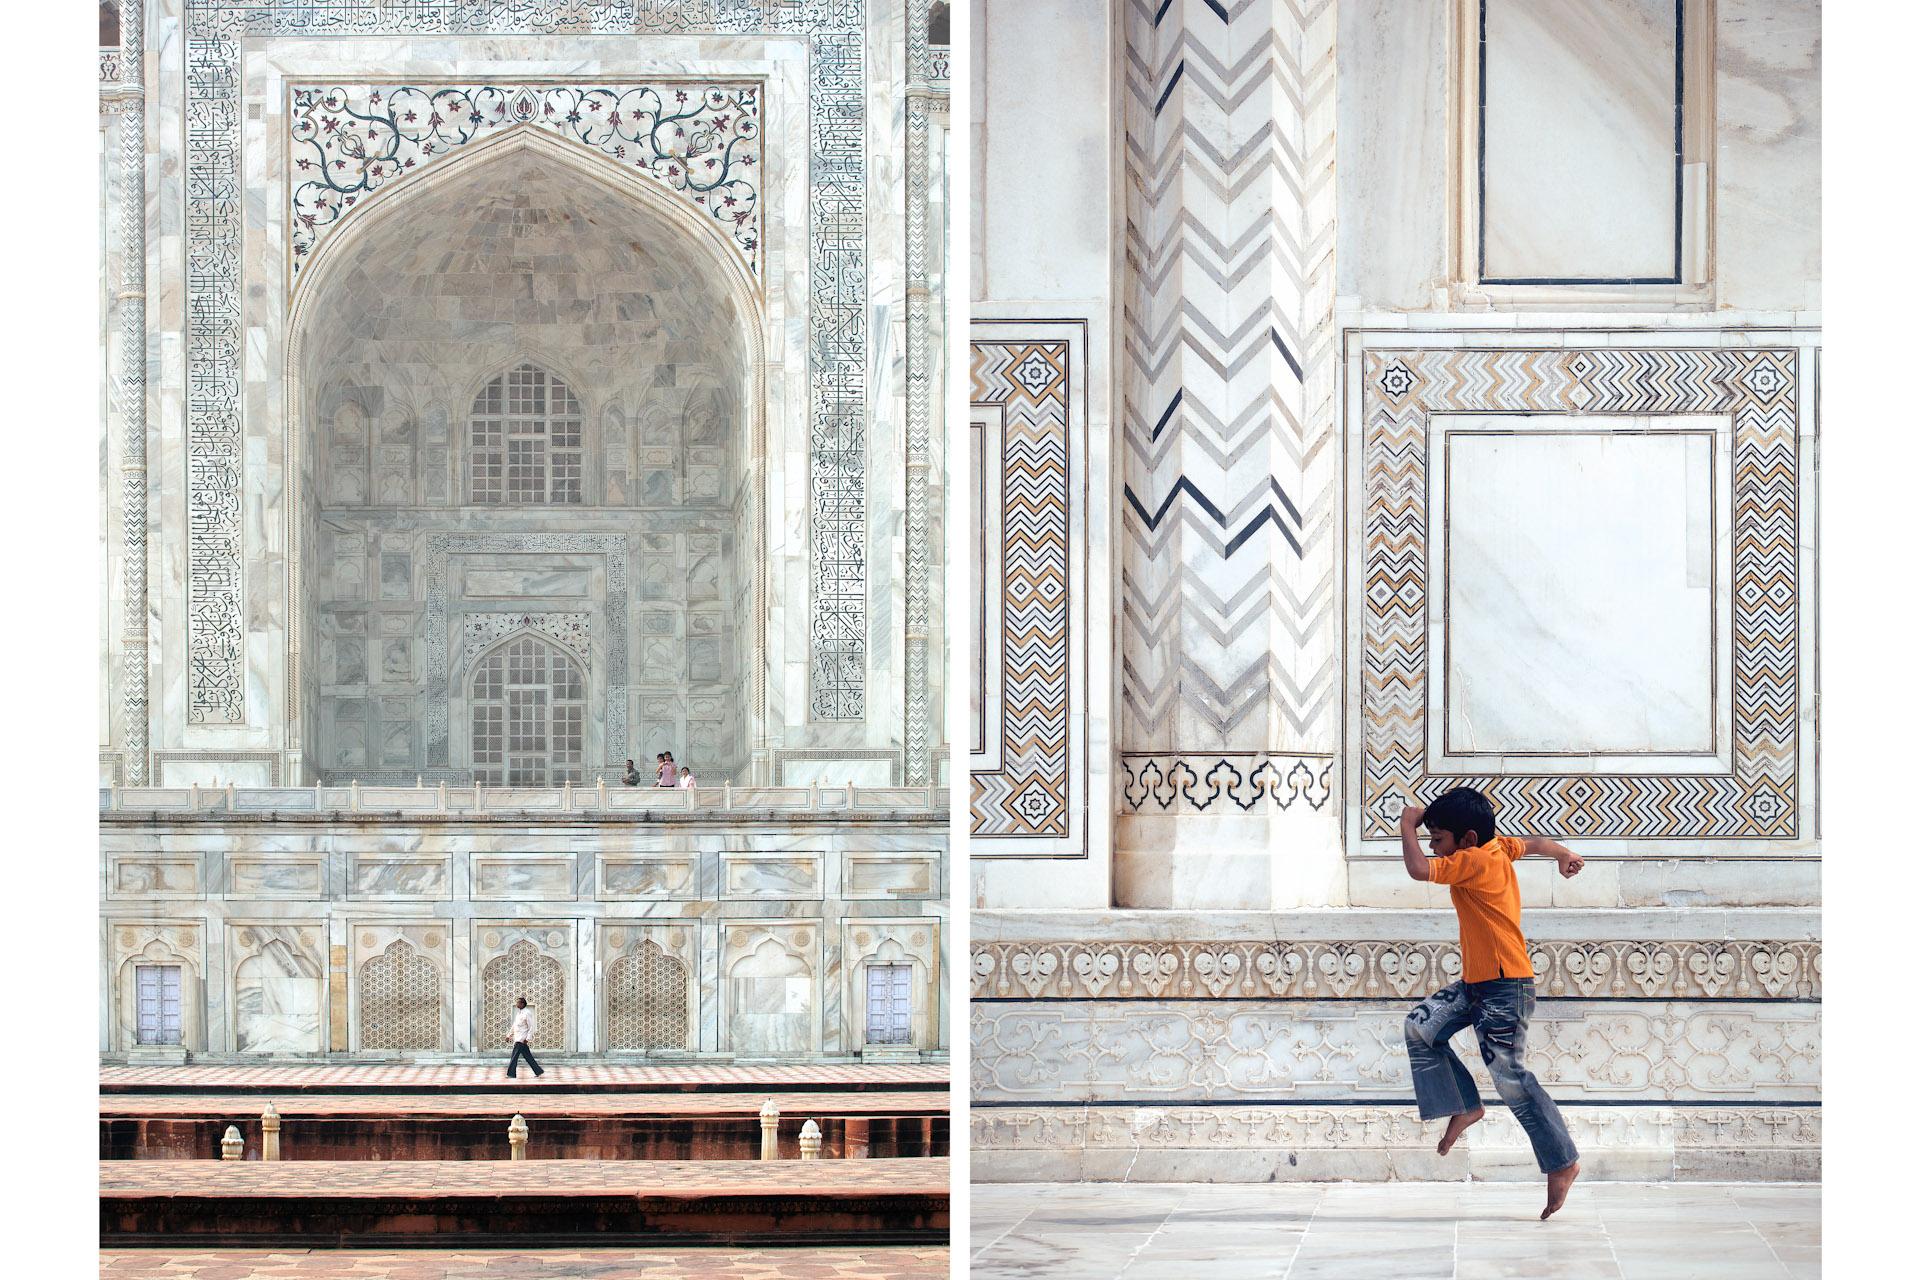 India-Travel-Agra-Taj-Mahal.JPG